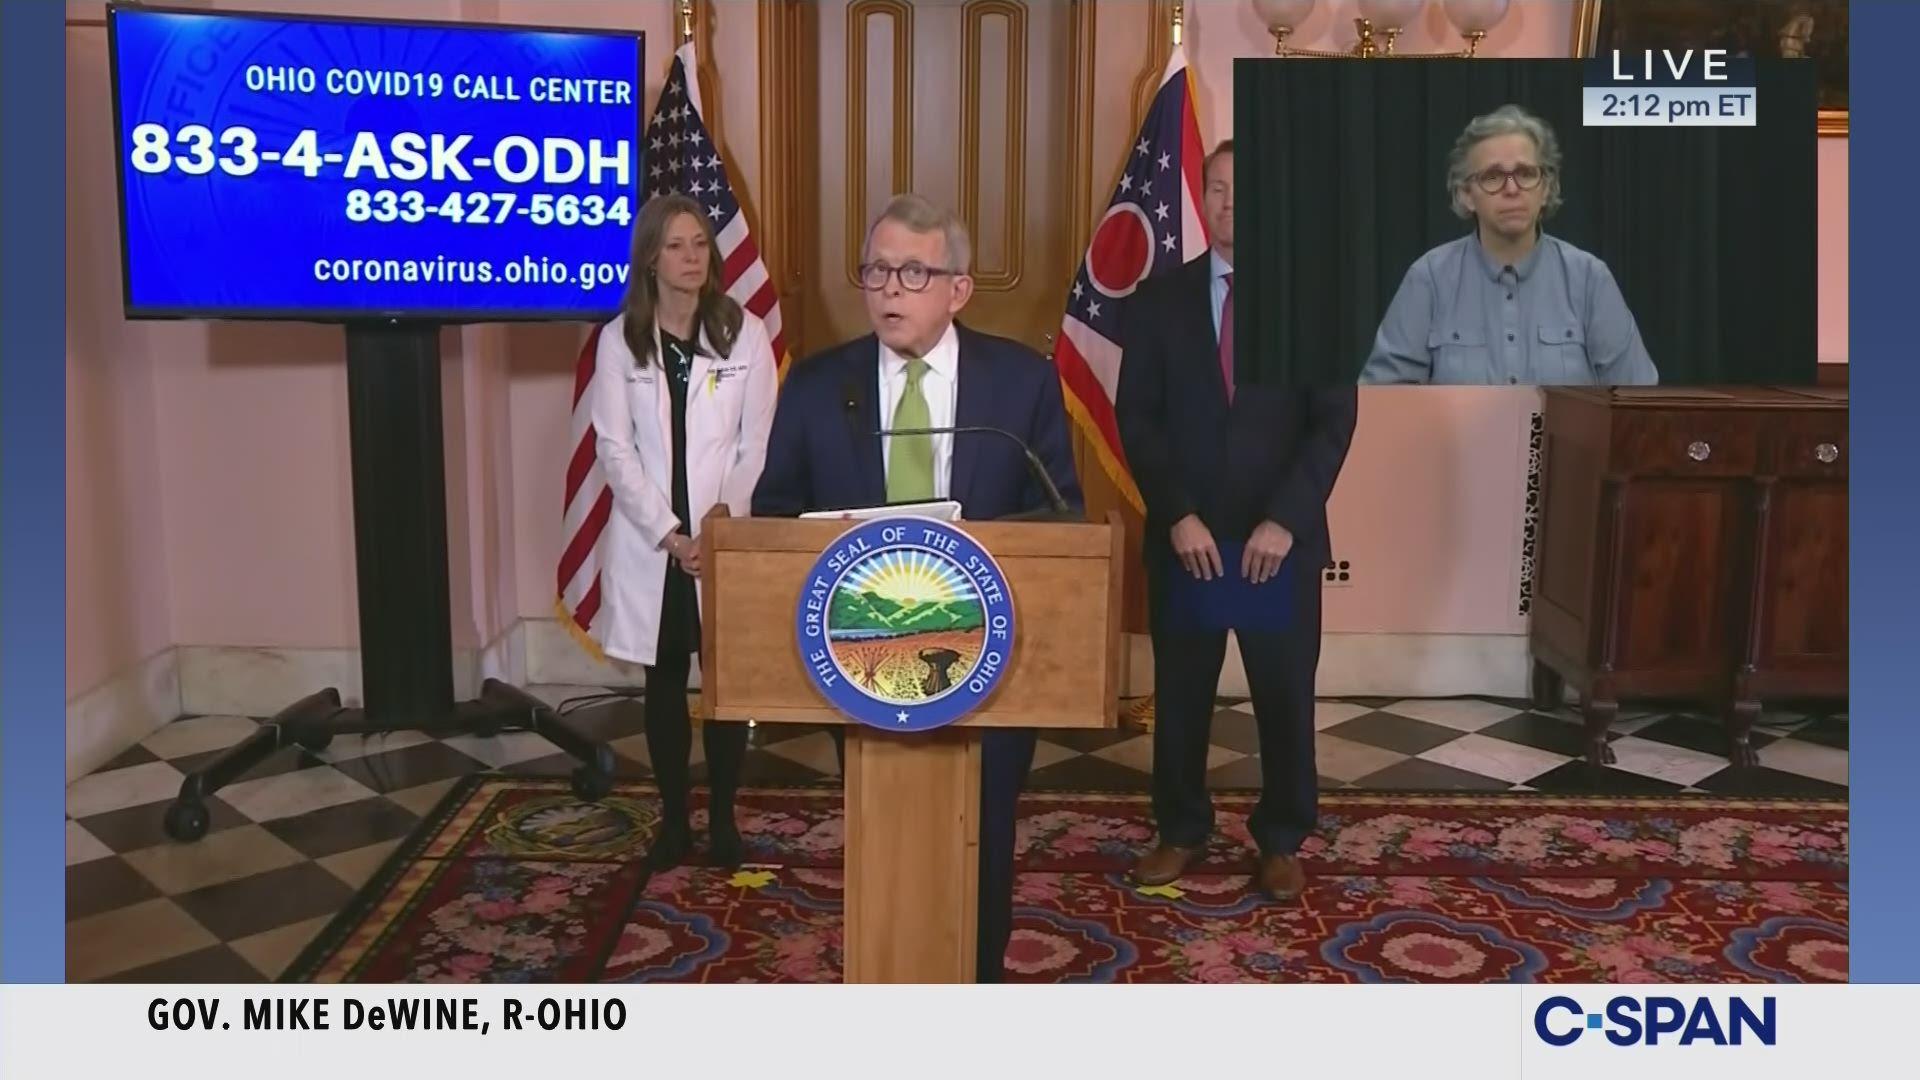 Ohio Governor Dewine Coronavirus News Conference C Span Org